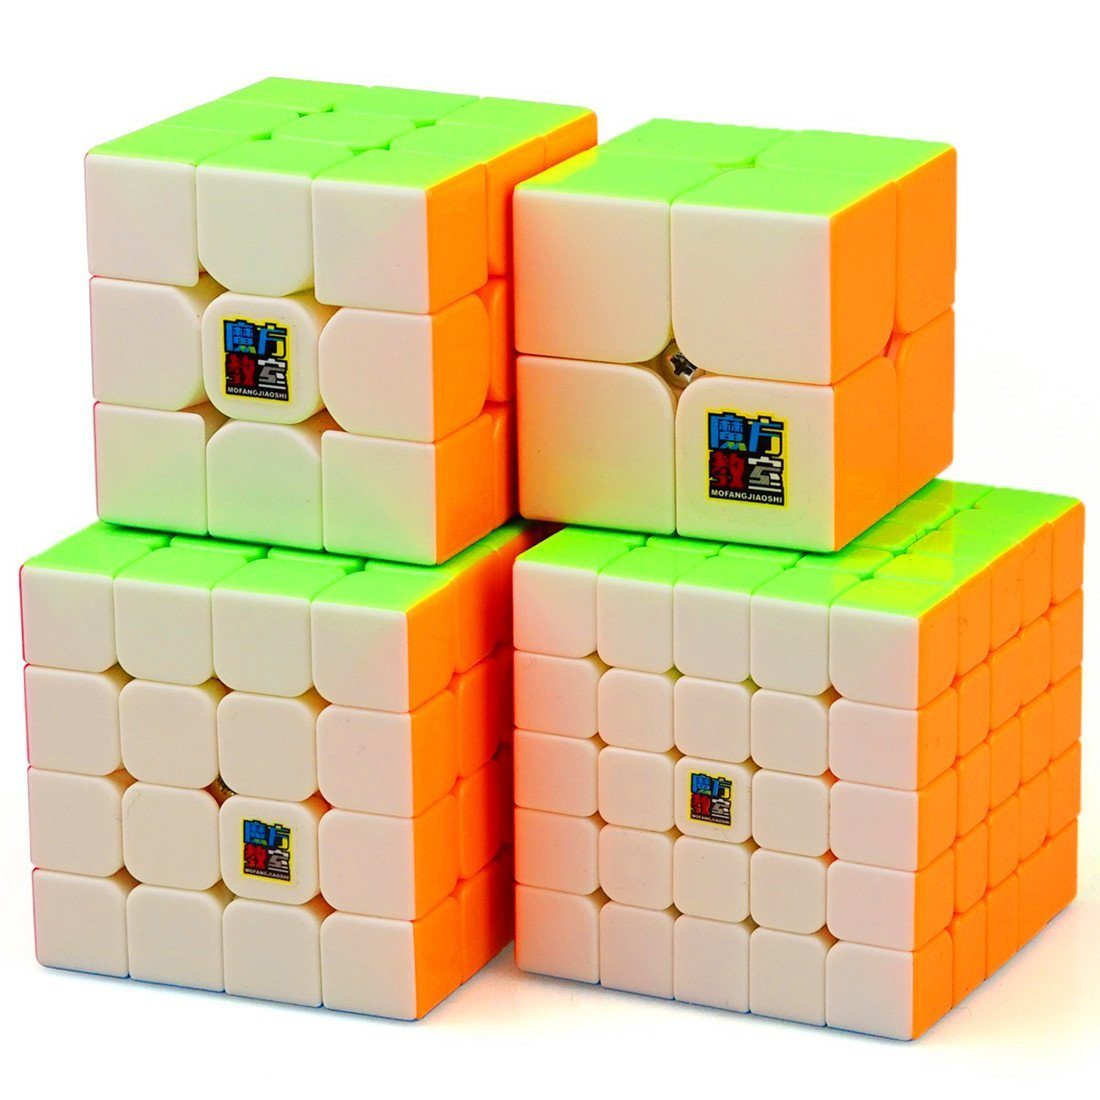 CuberSpeed Speedcubing Bundle MoFang JiaoShi MF2S 2X2 & MF3RS 3X3 & MF4S 4X4 & MF5 5X5 Stickerless Bright Magic cube Cubing Classroom Stickerless speed cube set with Gift Packing